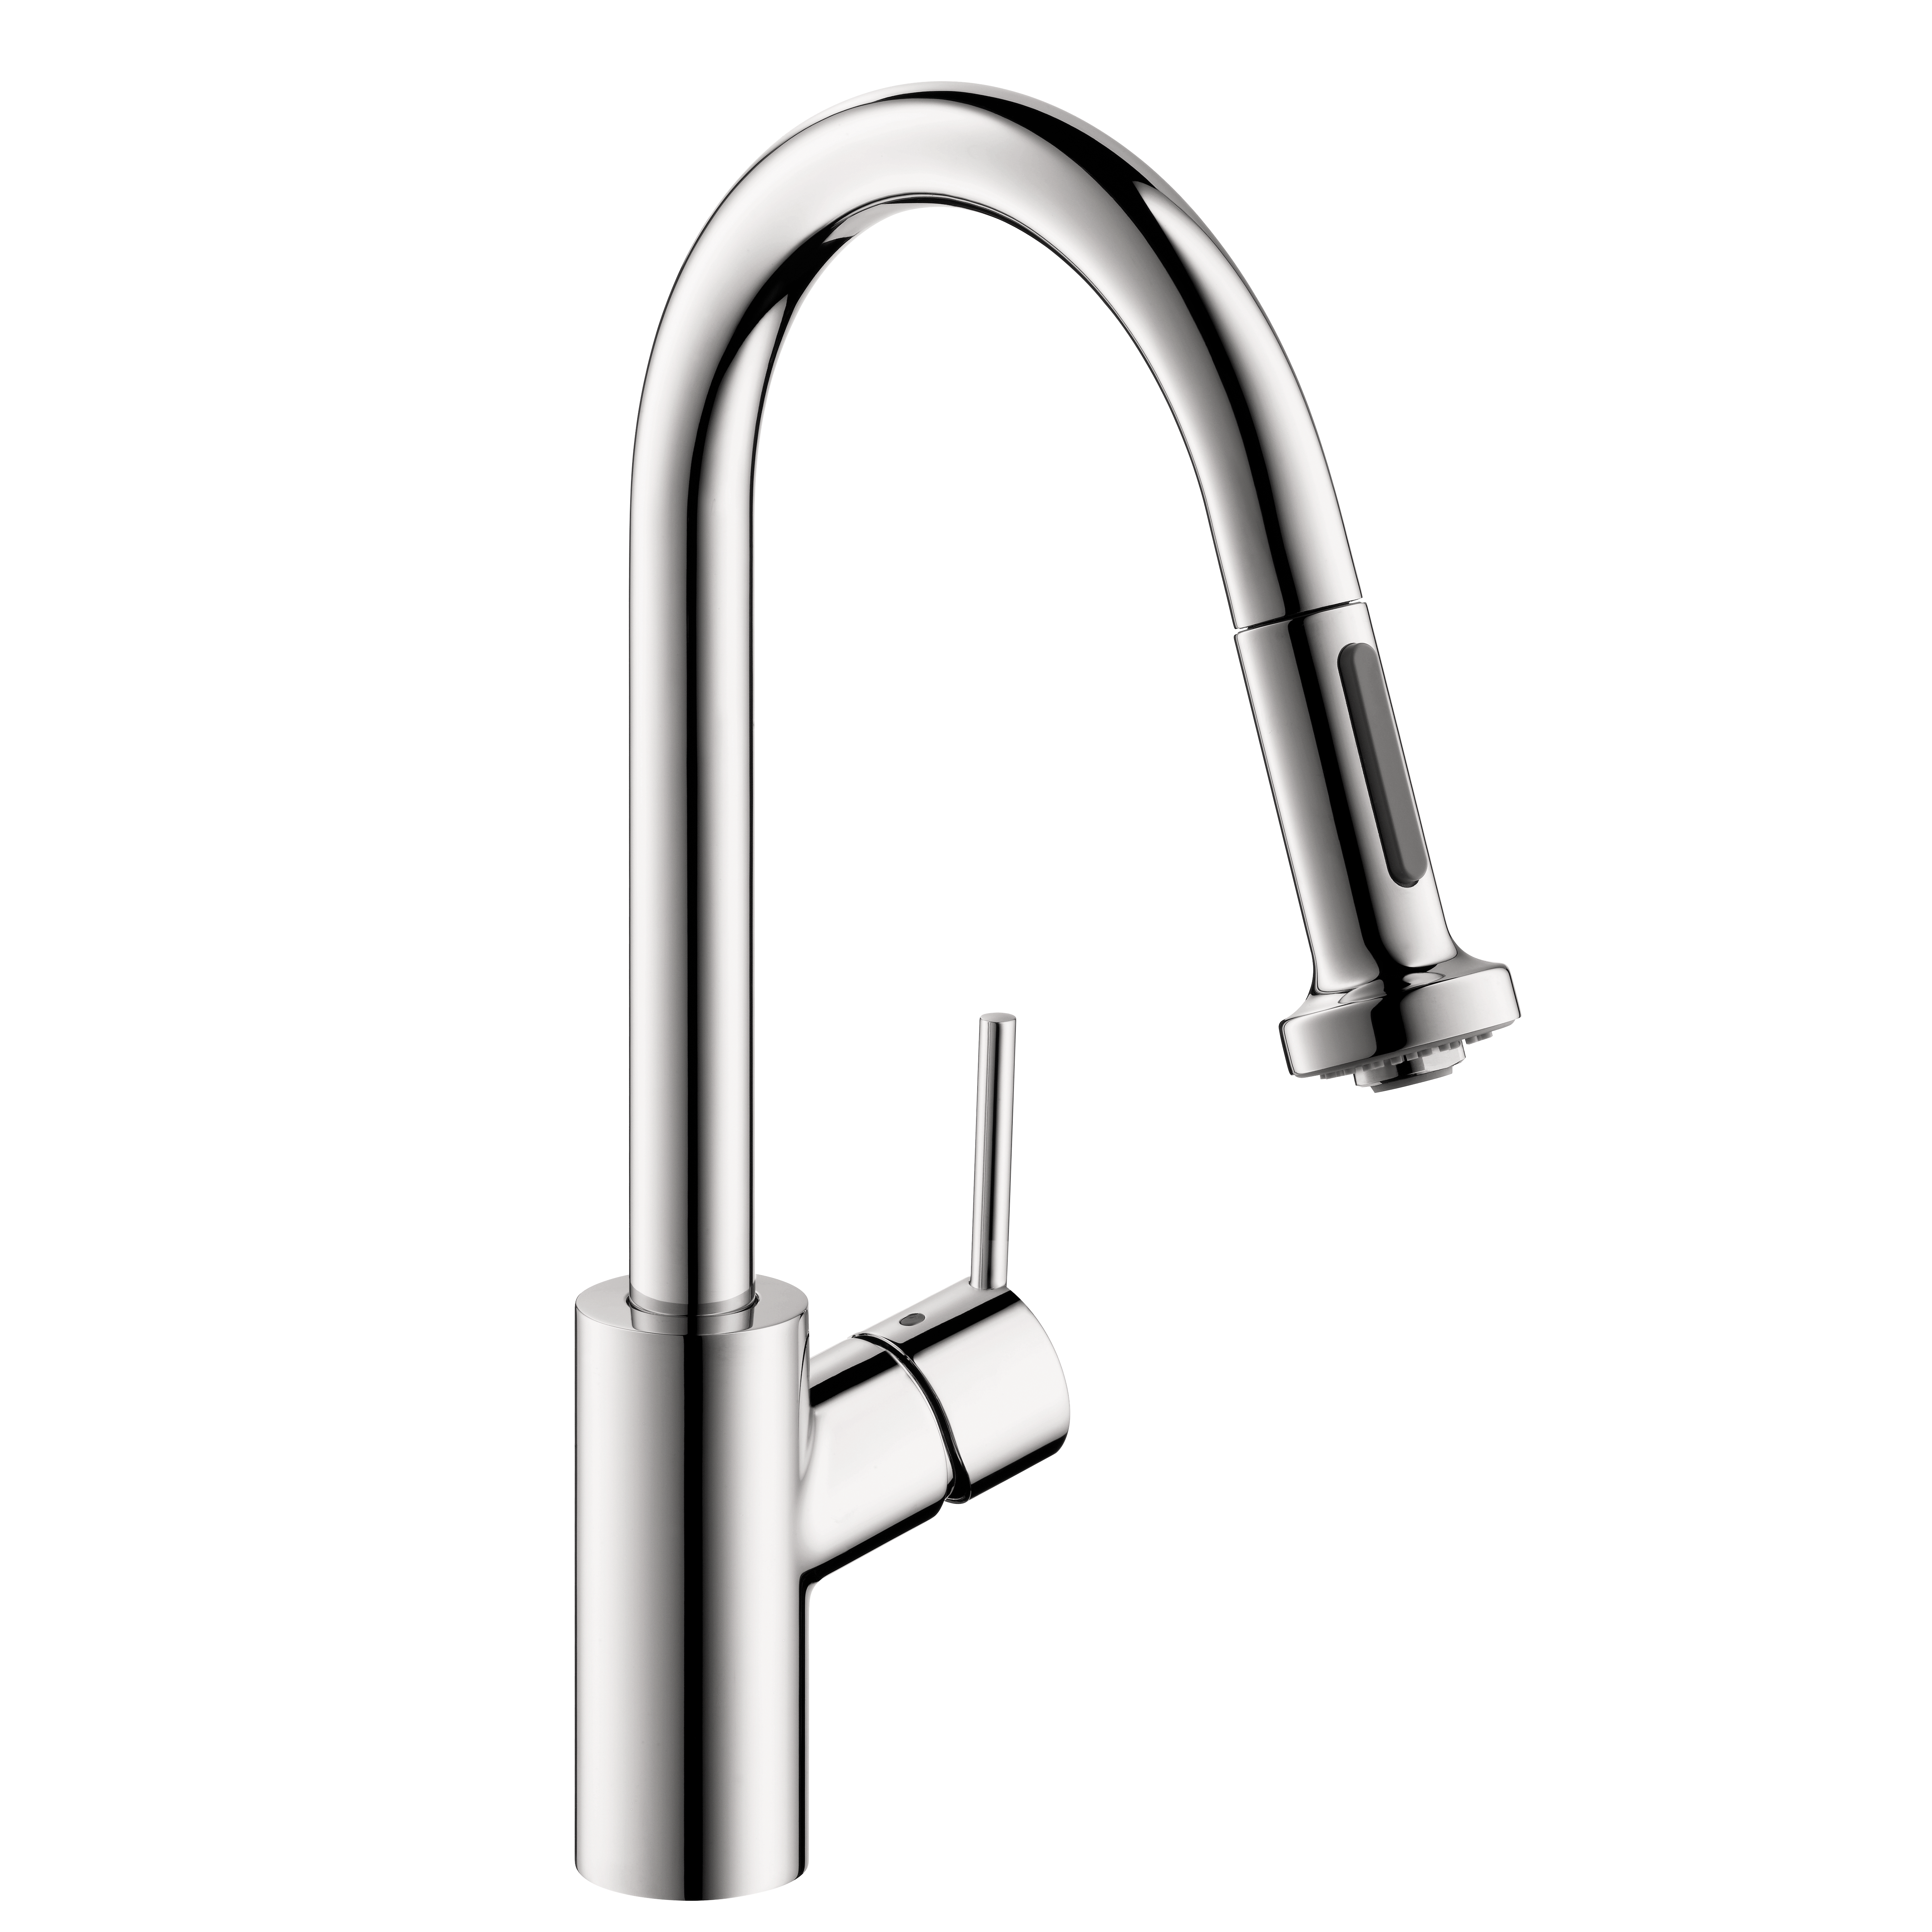 Hansgrohe 14877 Talis S Kitchen Faucet | QualityBath.com